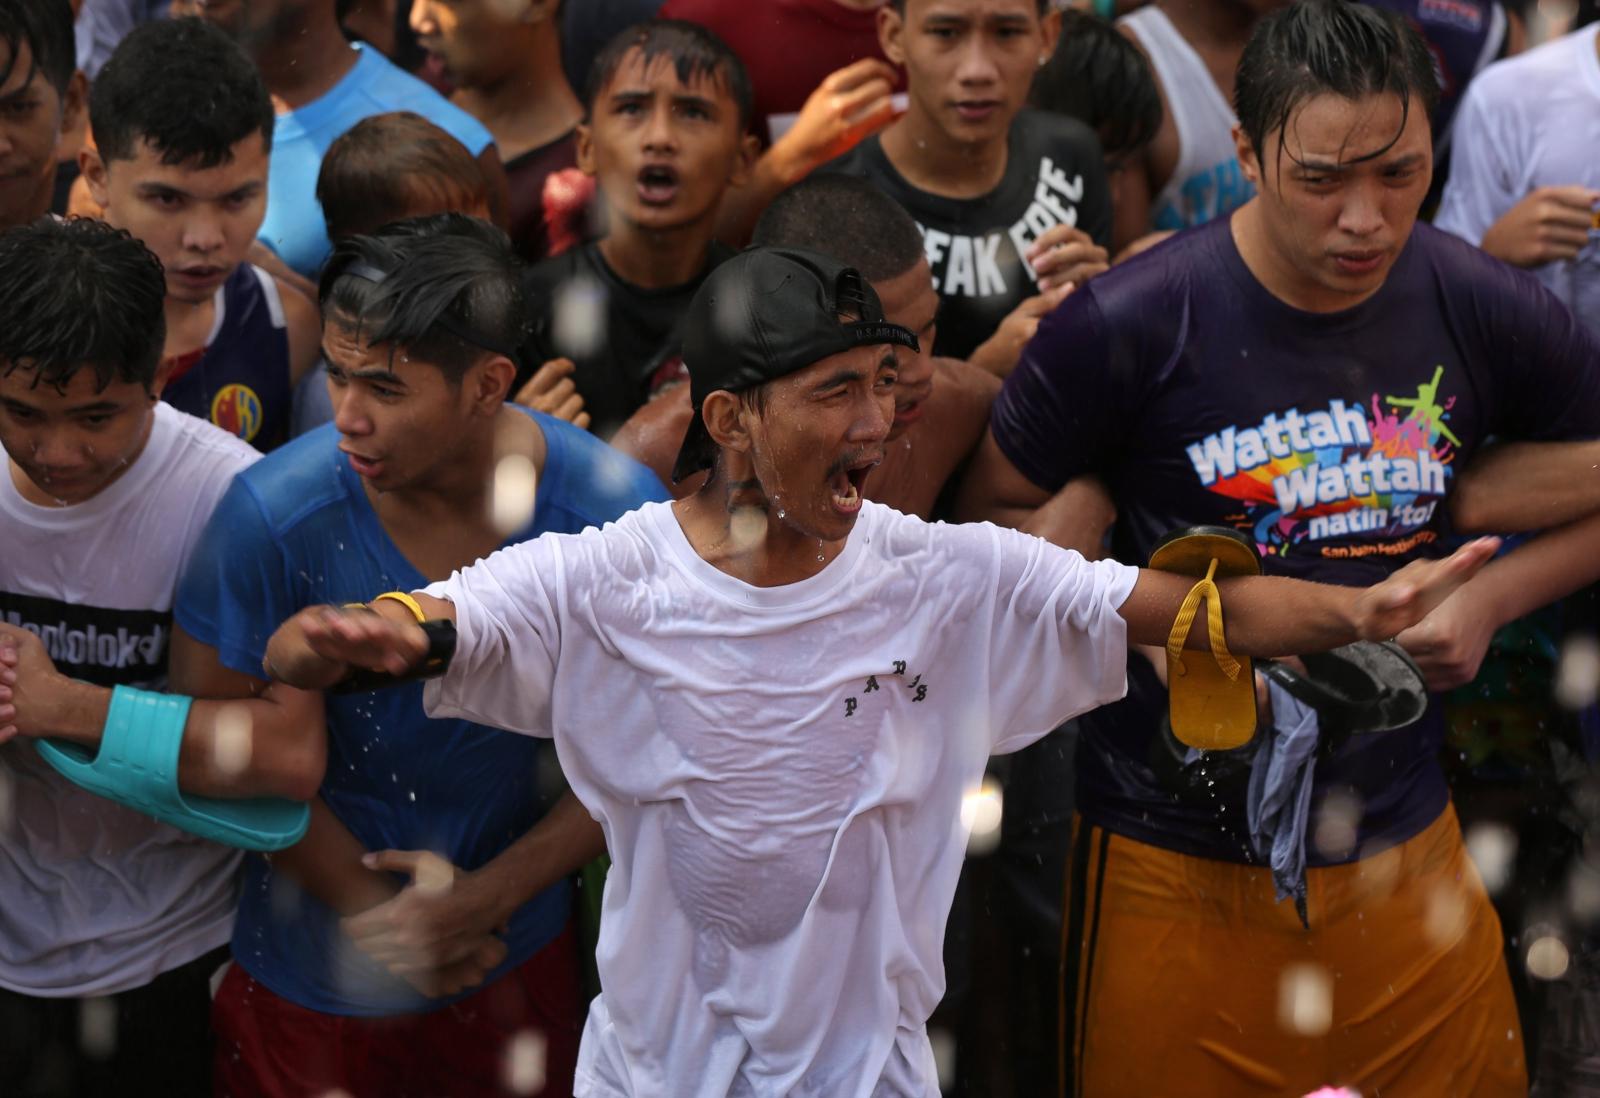 Festiwal Wattah Wattah. fot. EPA/EUGENIO LORETO